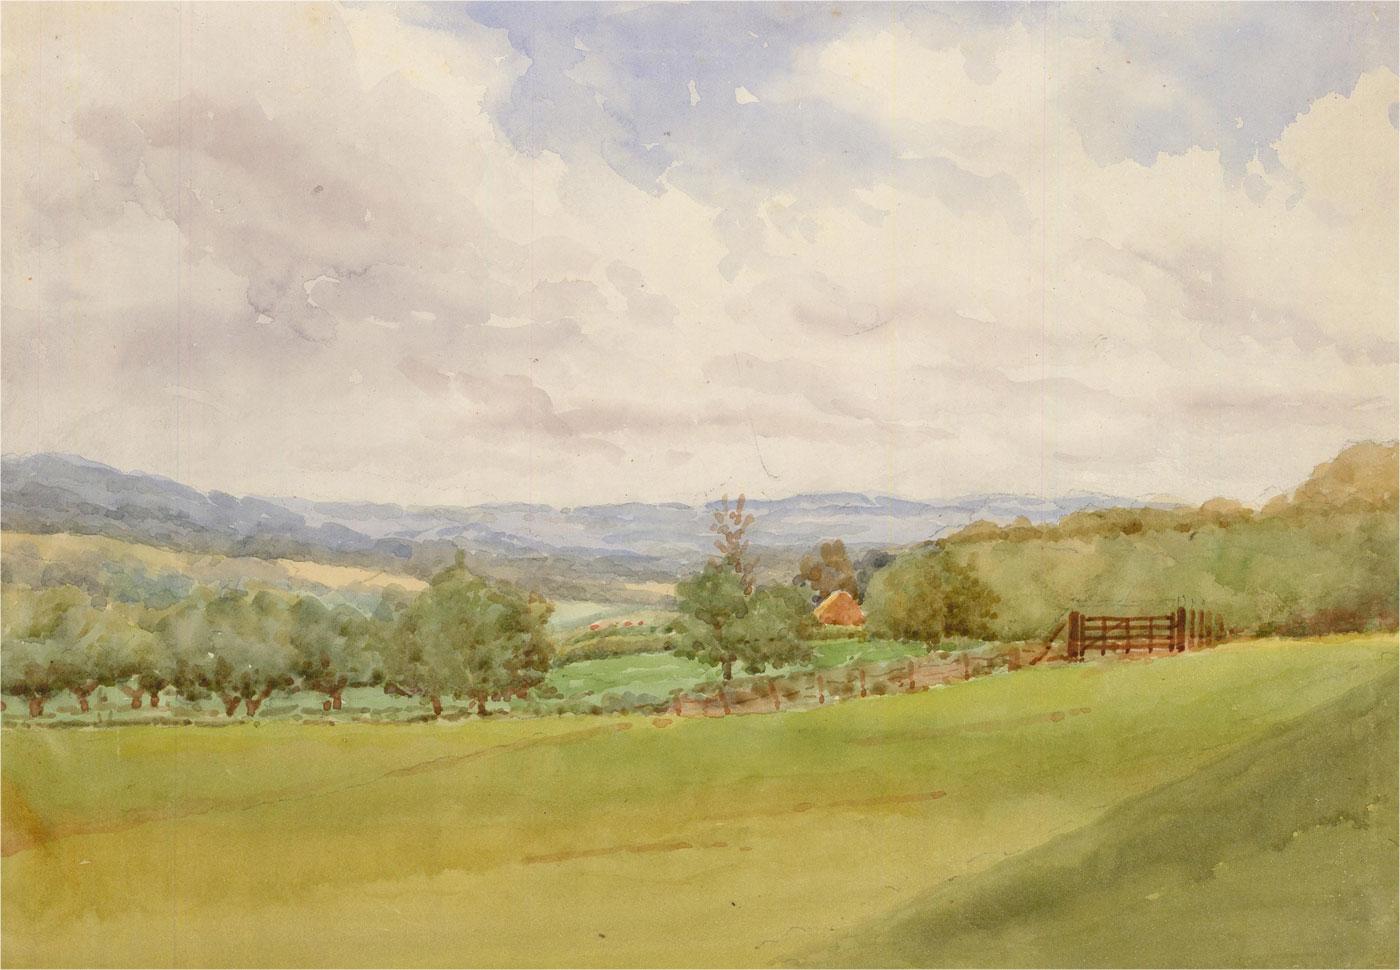 Raymond Turner Barker (1872-1945) - 1933 Watercolour, Etchingham